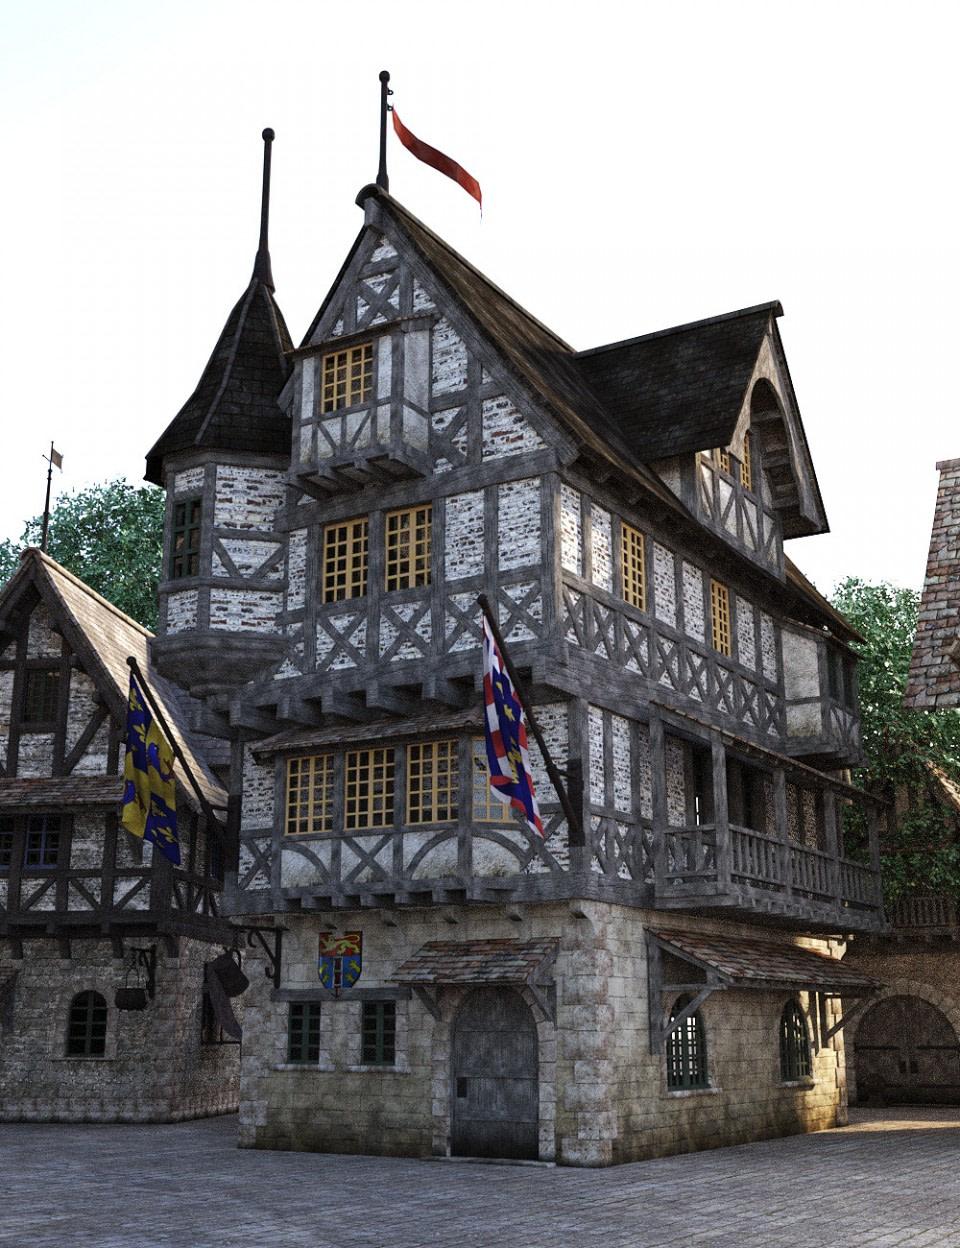 daz3d modular medieval village 3d environment